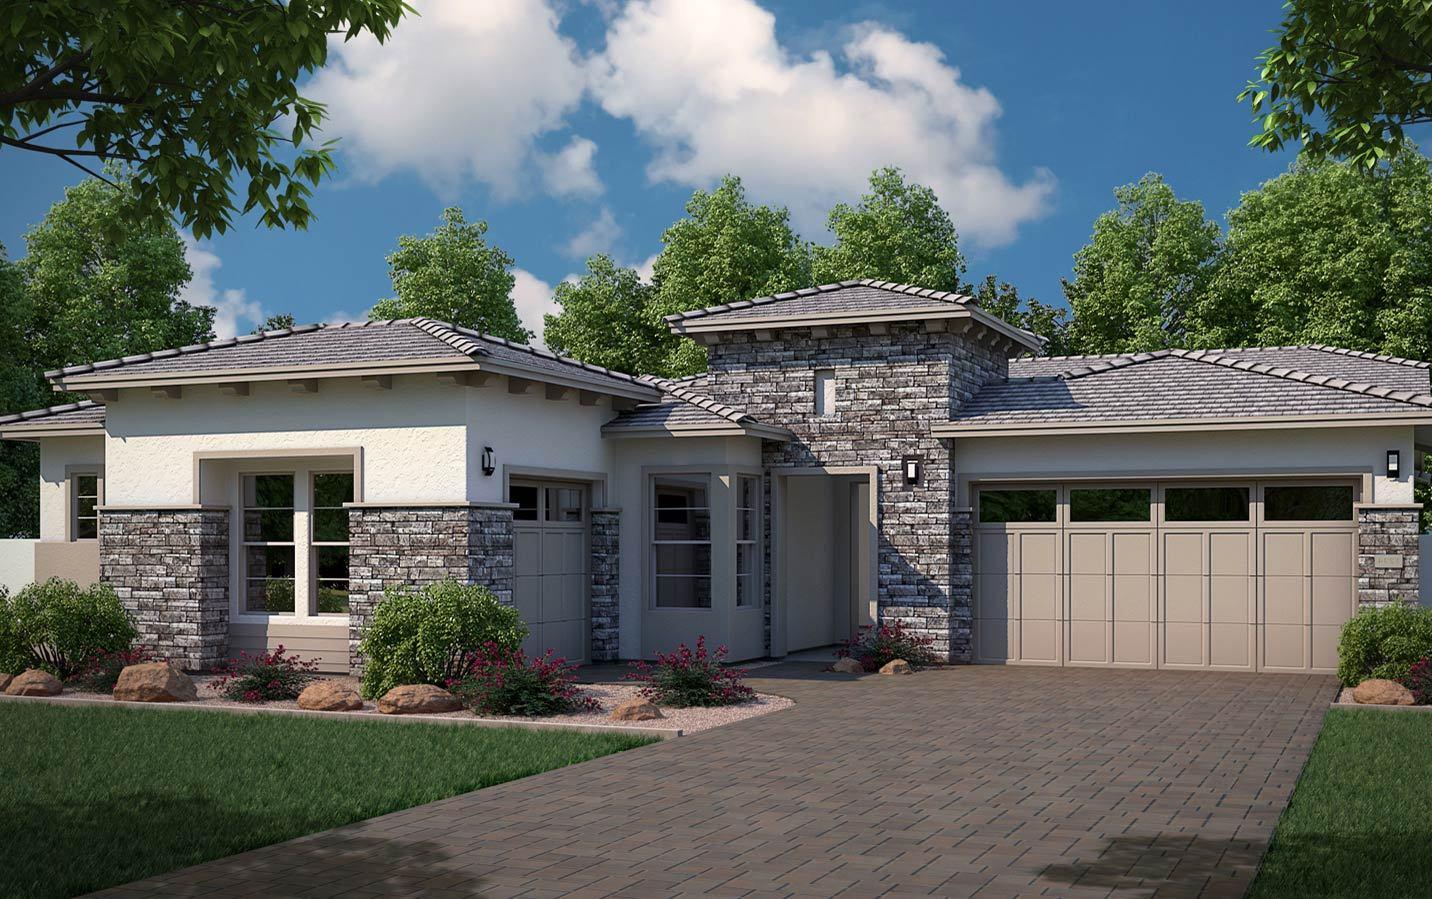 http://partners-dynamic.bdxcdn.com/Images/Homes/Marac4964/max1500_35154440-200109.jpg